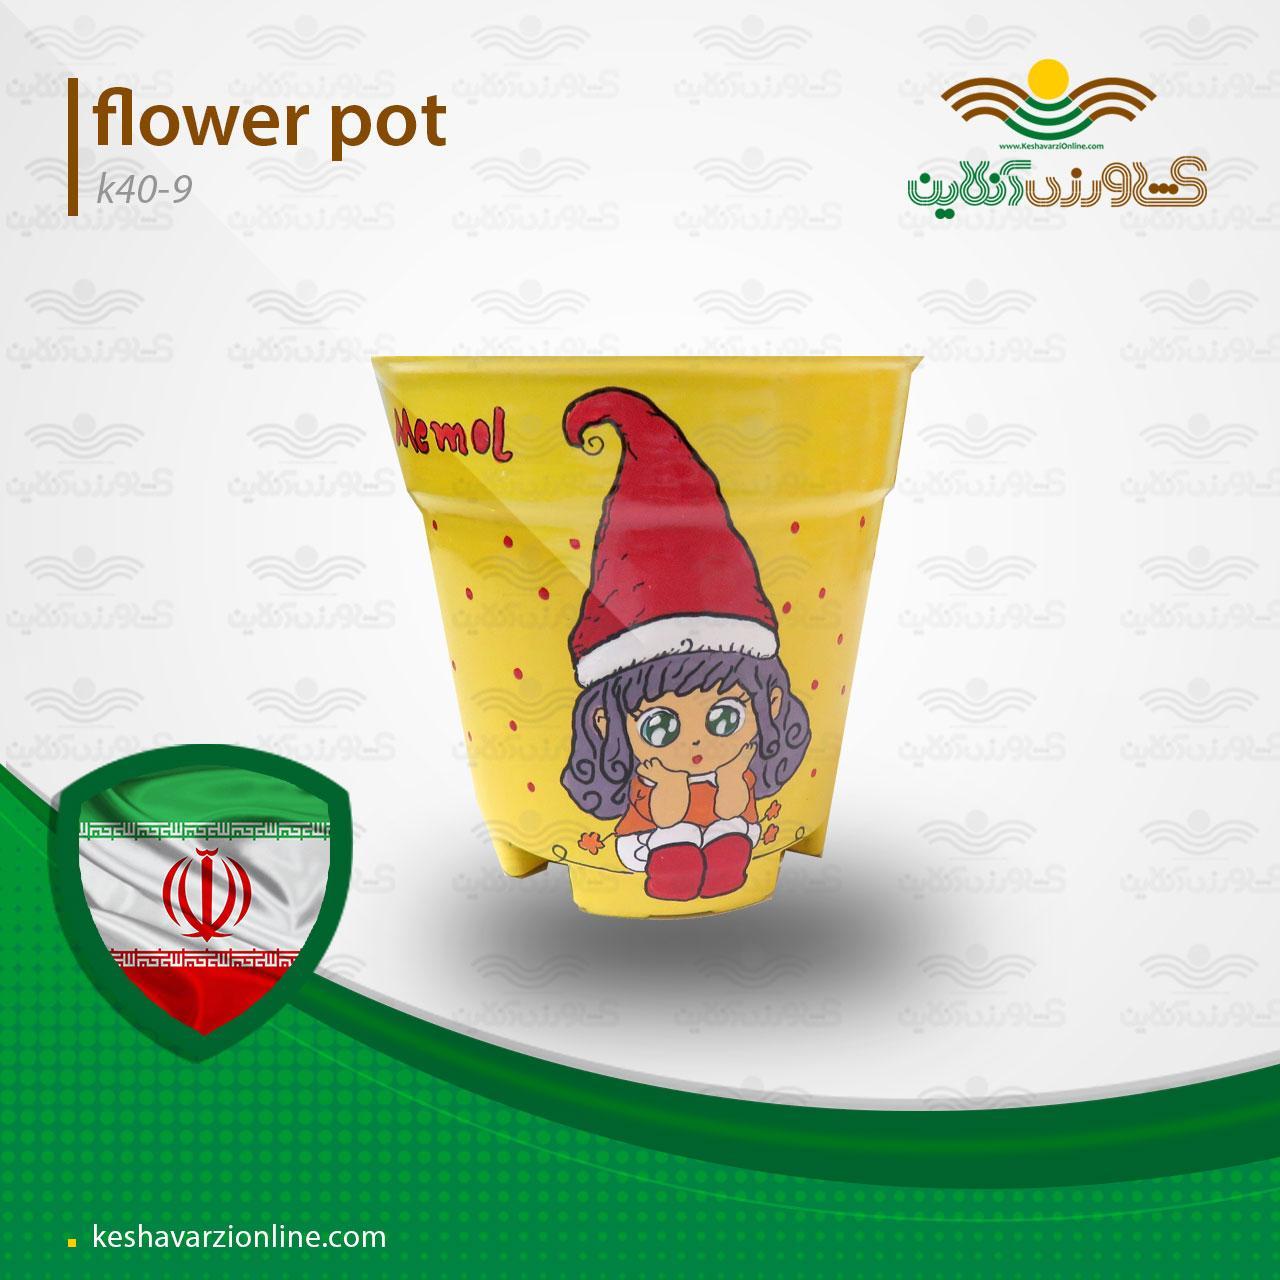 گلدان دکوری K40.9